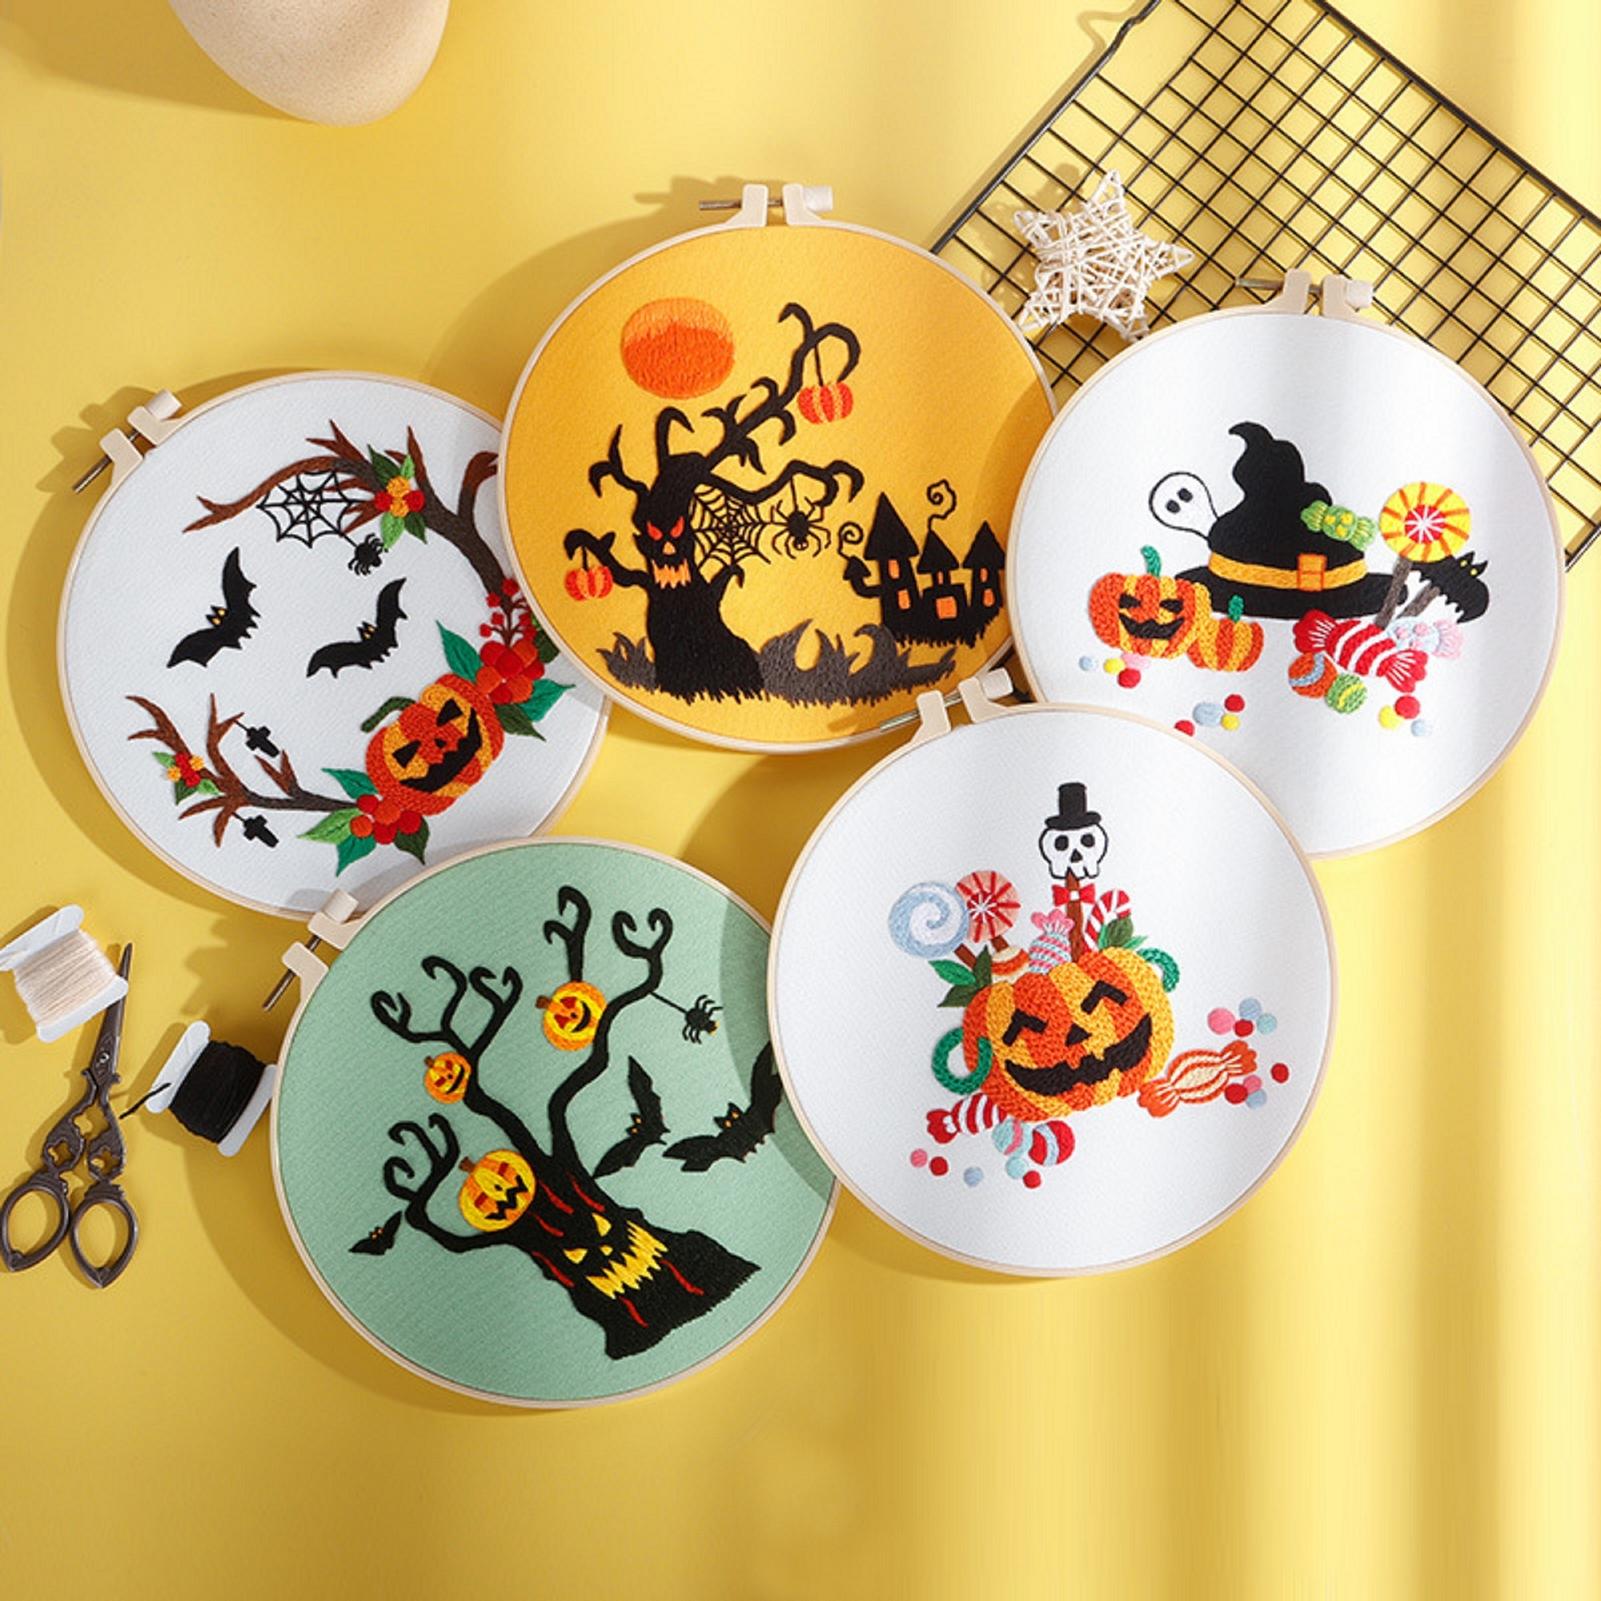 Halloween Embroidery Kit for Beginners  with Hoop, Thread, Needles, Full Kit, DIY Craft for Beginner